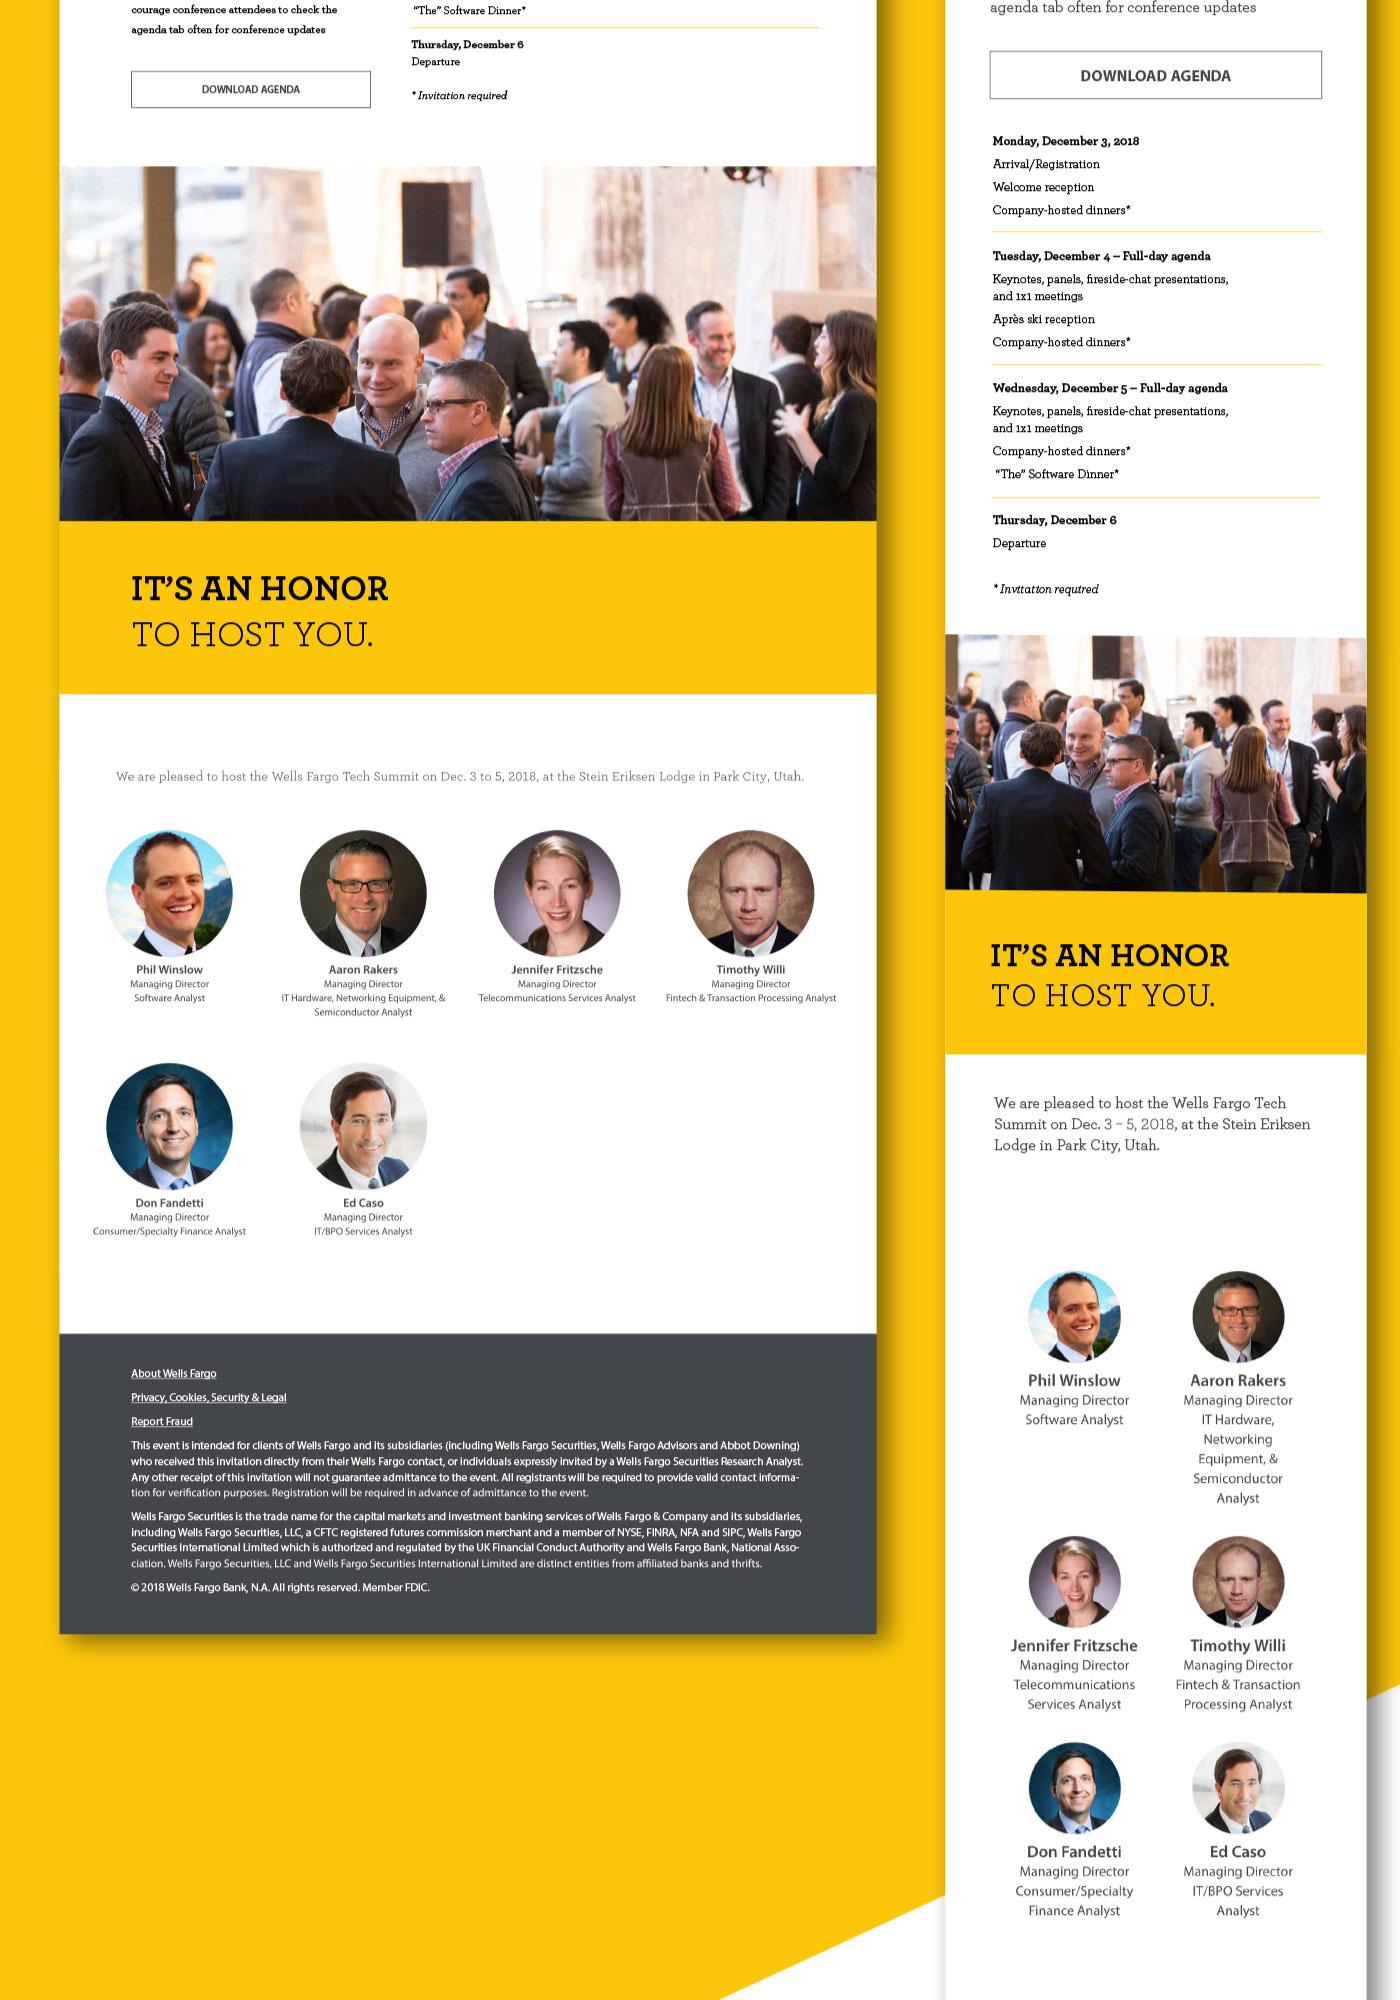 Wells Fargo Tech Summit design shown in desktop and mobile view